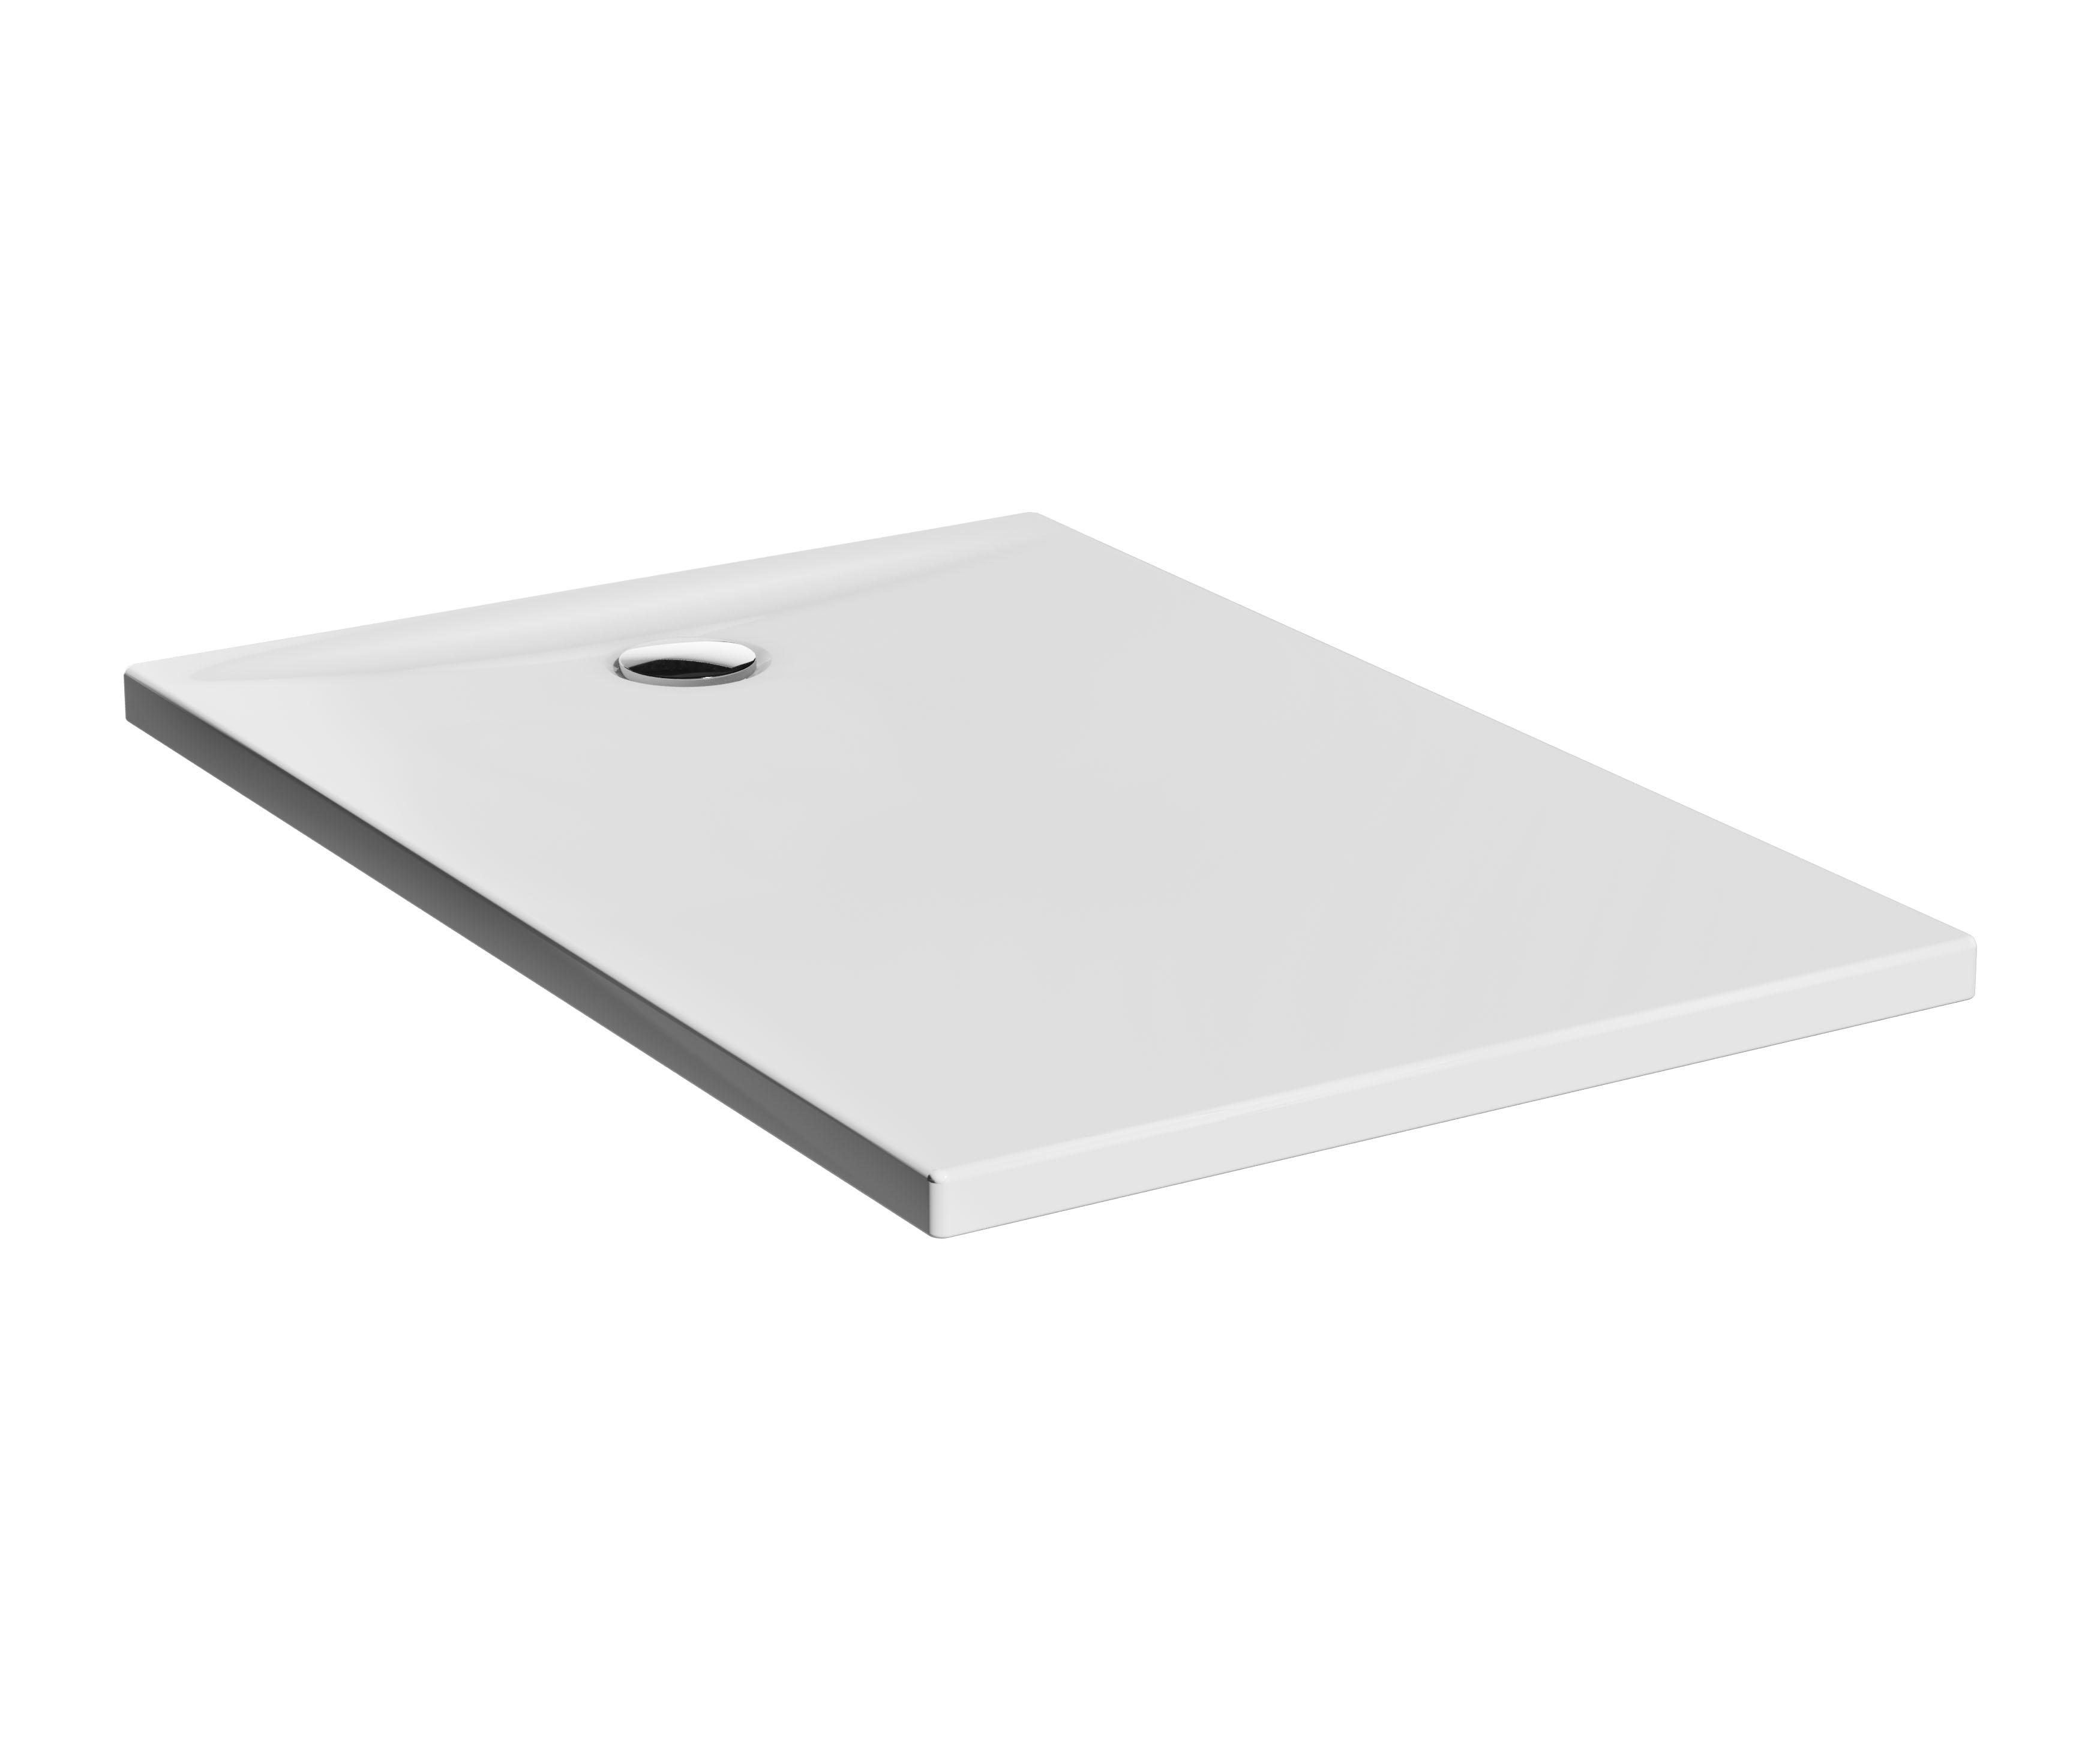 Lagoon receveur ultra plat en céramique, 120  x  80 cm, blanc